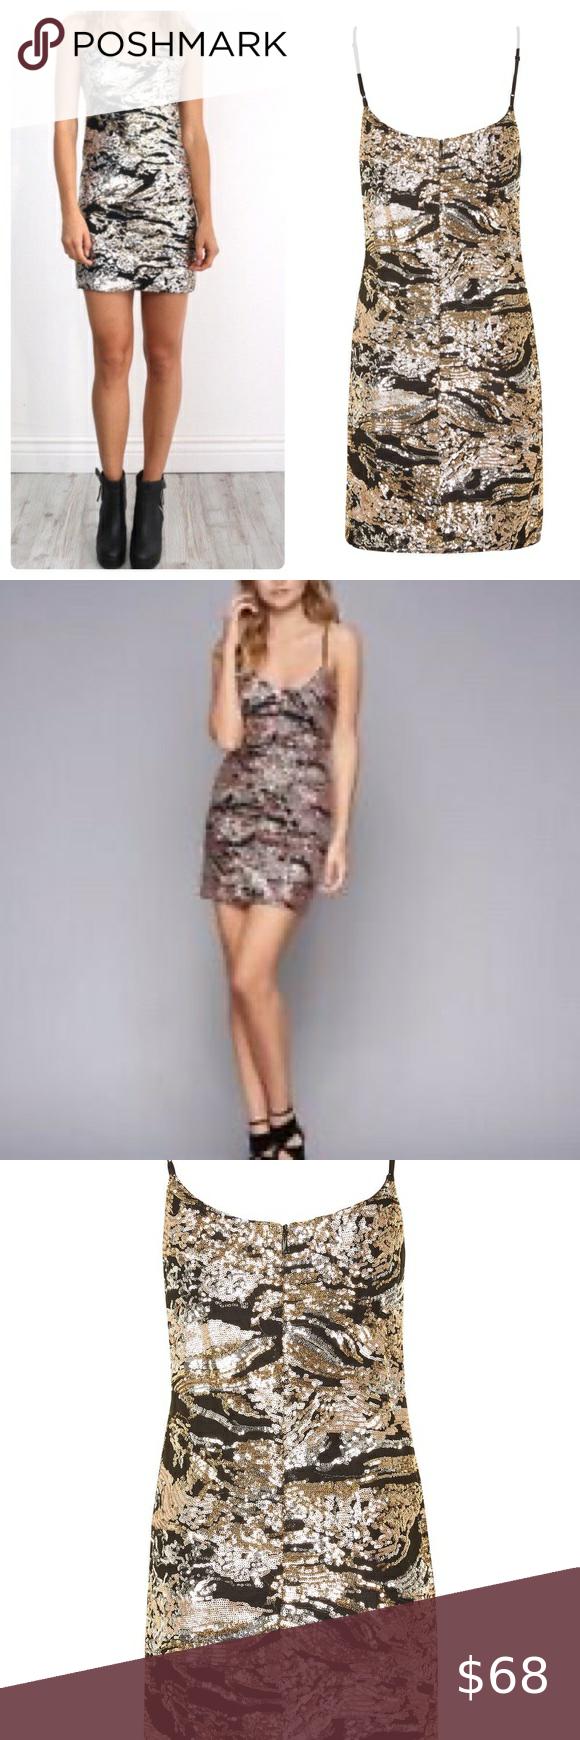 Wyldr Pixie Rose Gold Sequin Mini Dress Topshop In 2020 Top Shop Dress Black Sequin Mini Dress Sequin Mini Dress